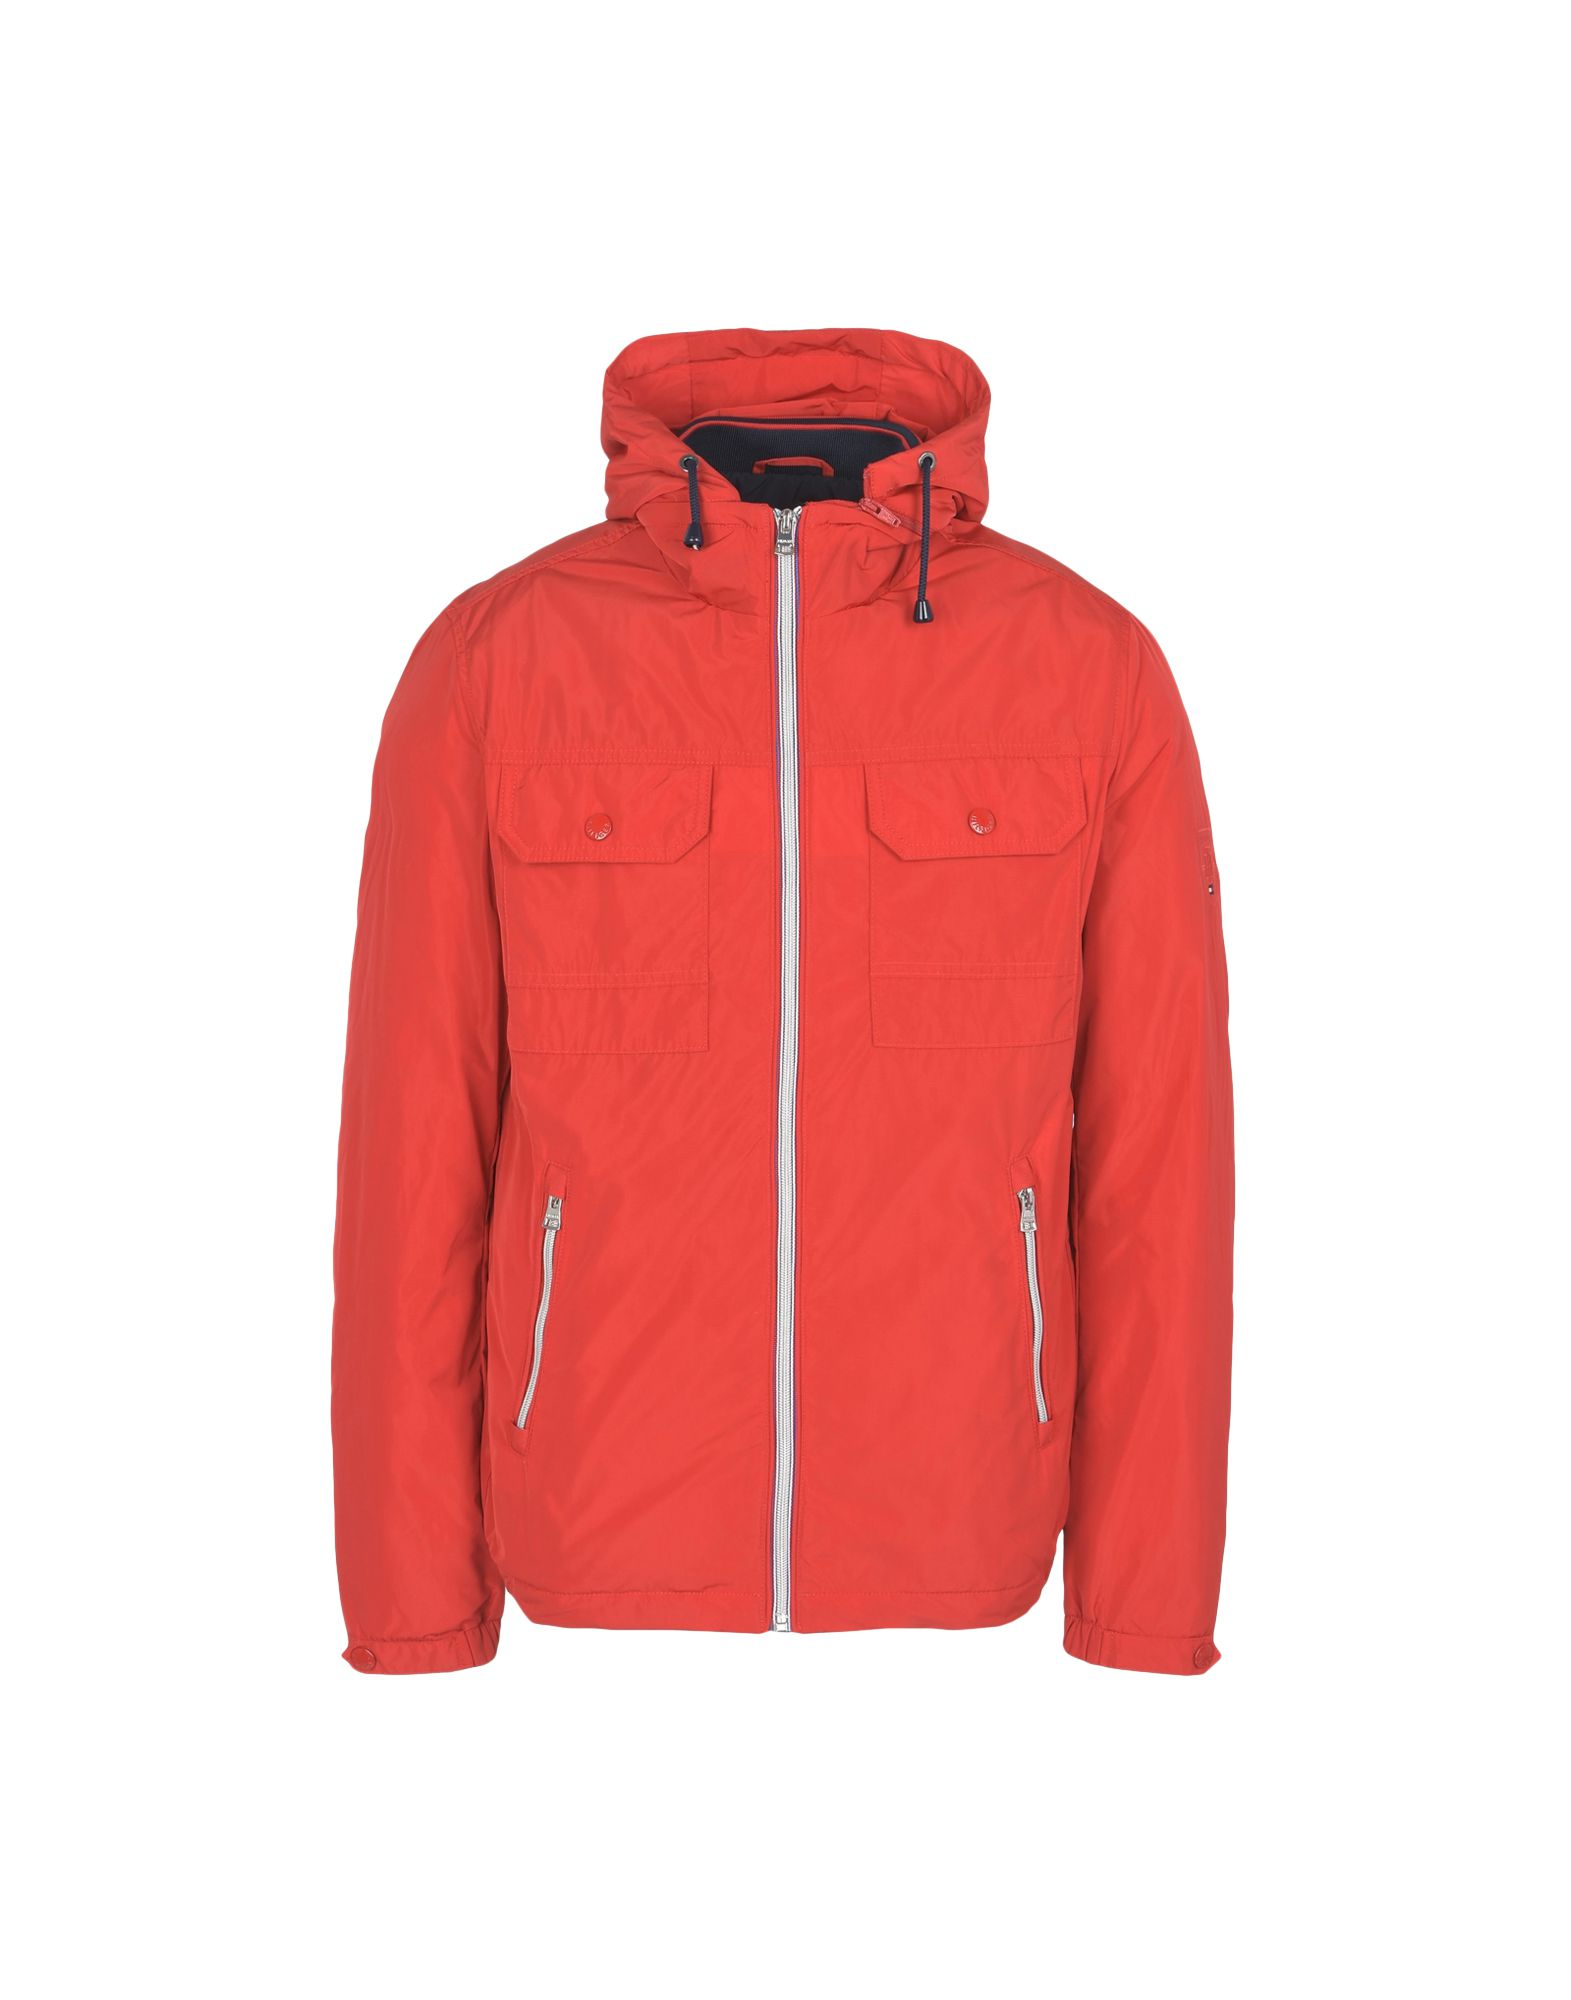 Giubbotto Tommy Hilfiger Barney Hooded Jacket - Uomo - Acquista online su